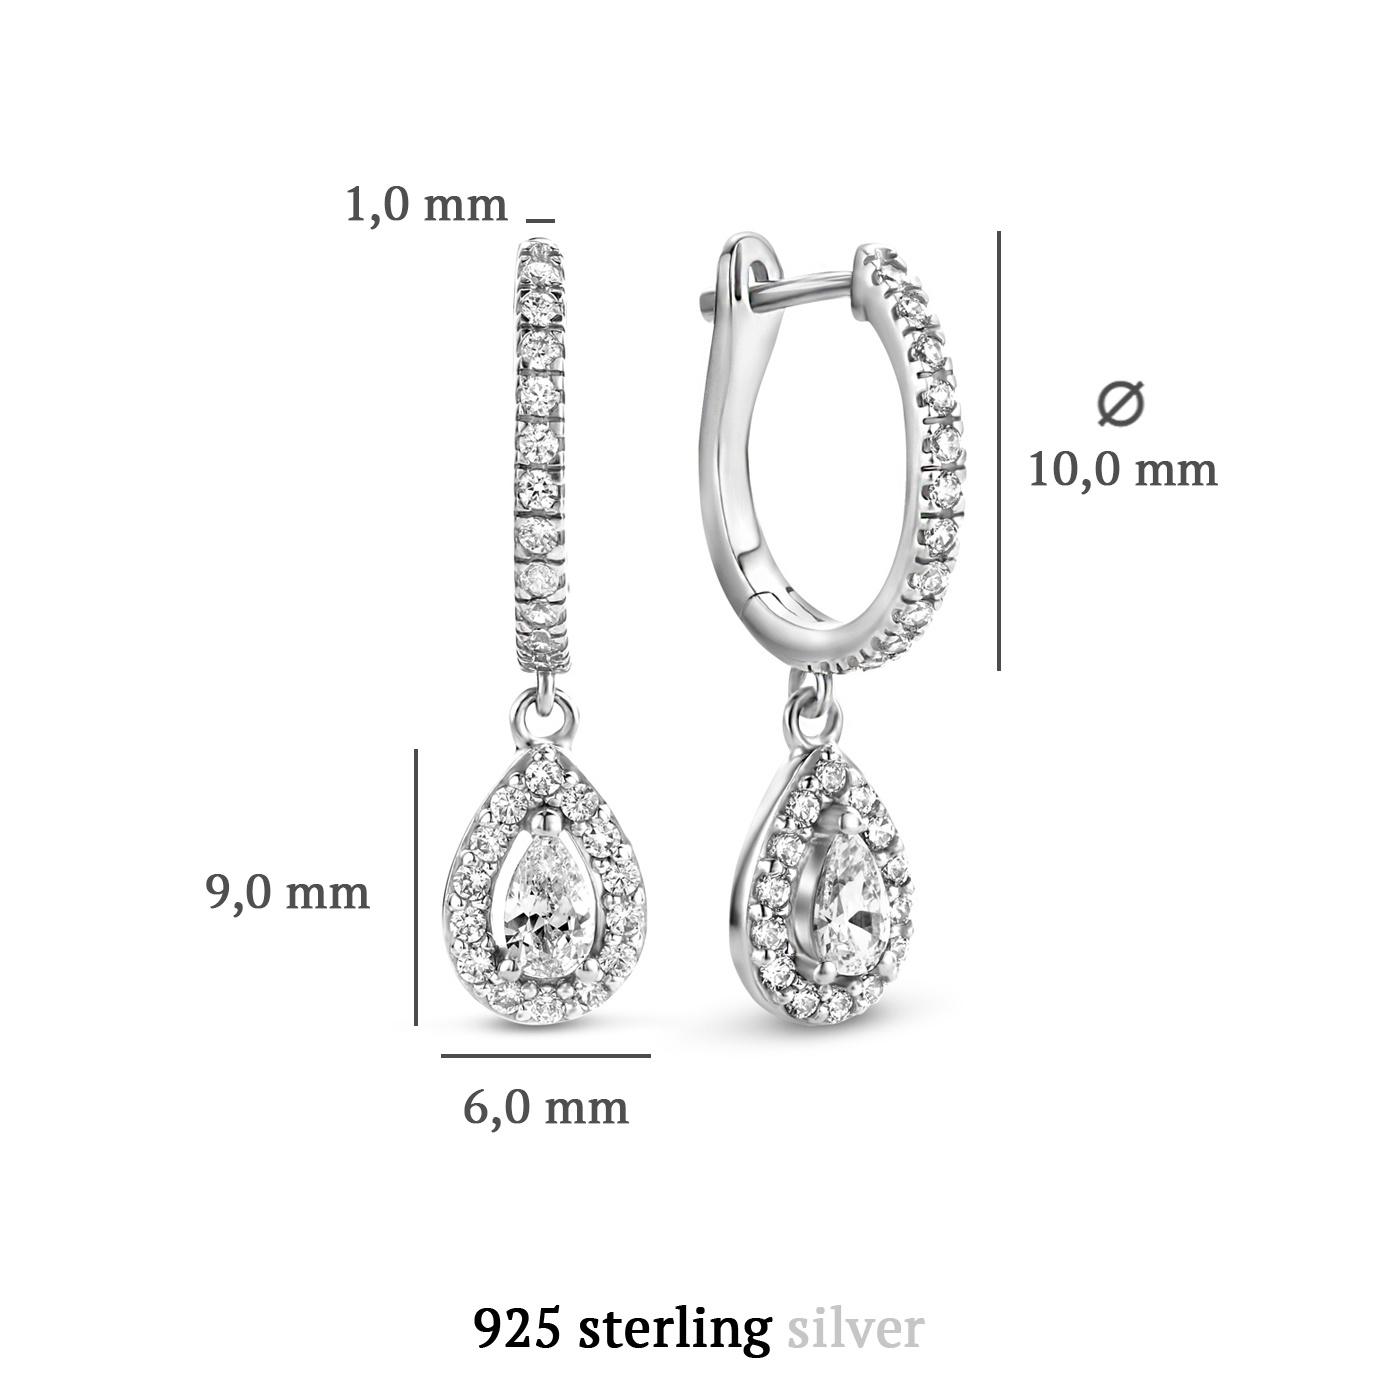 Parte di Me Ponte Vecchio Pitti 925 sterling silver drop earrings with zirconia